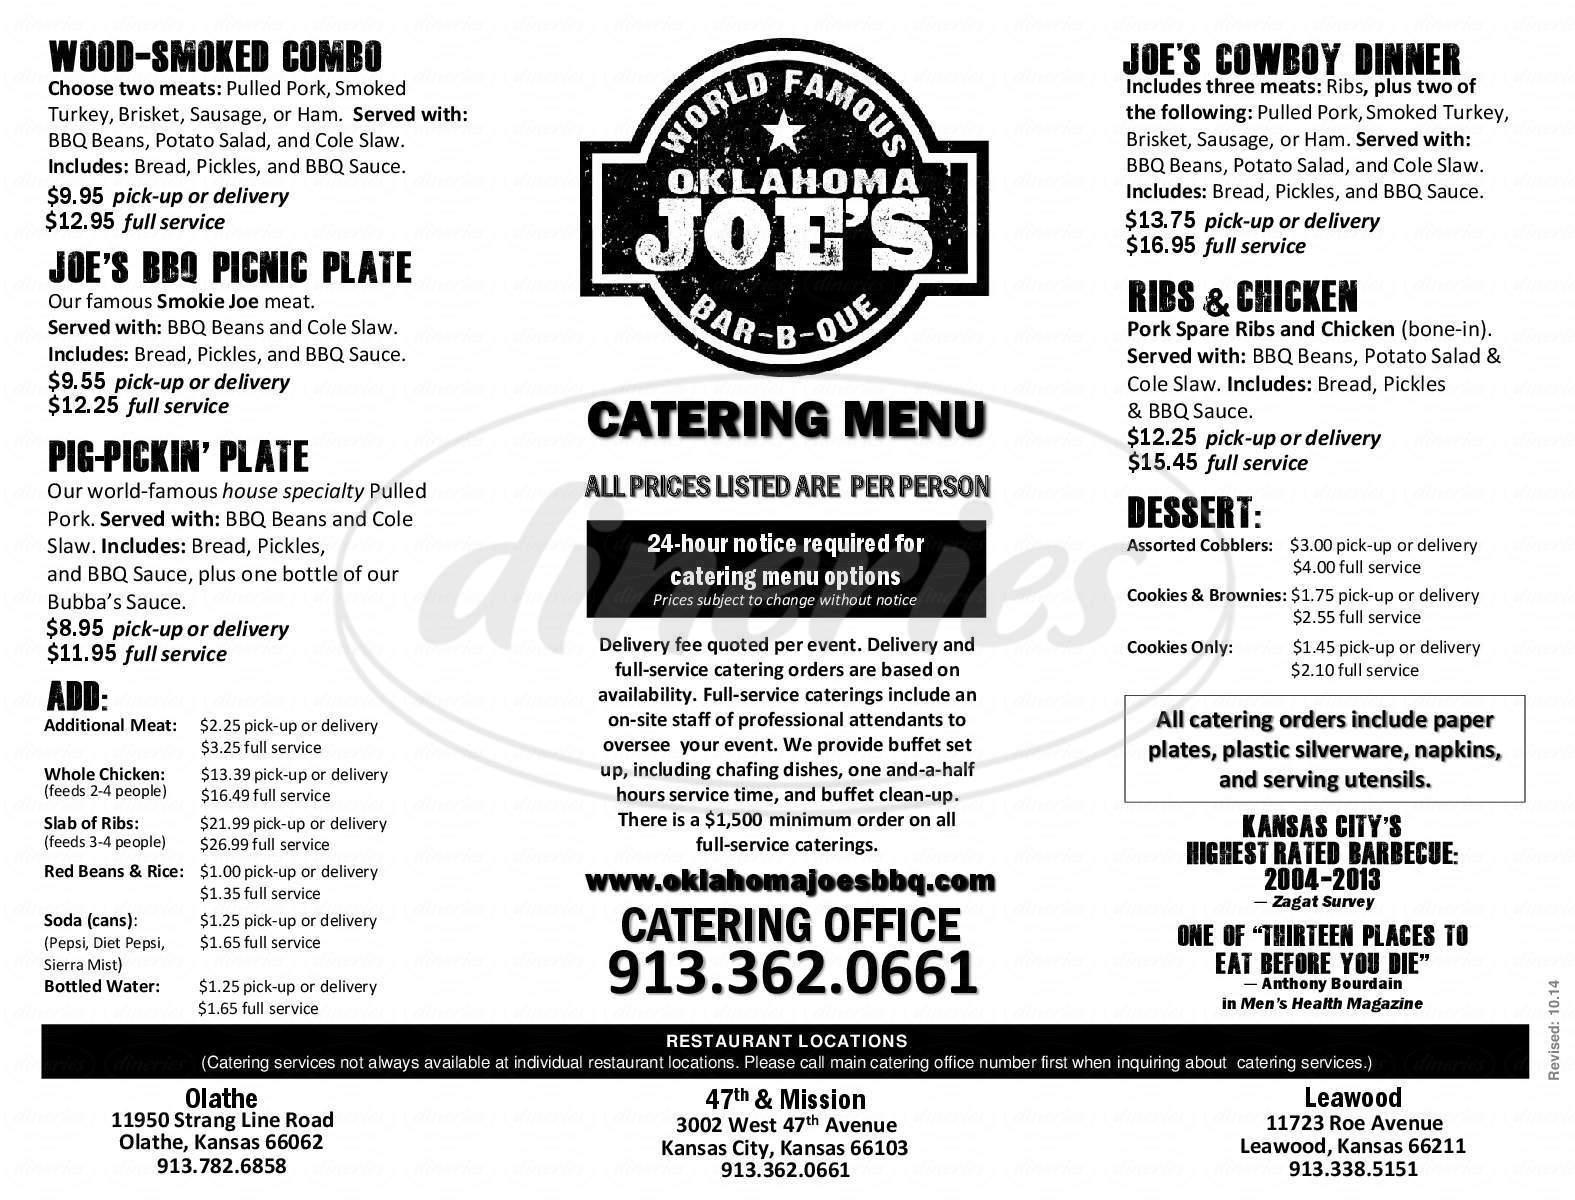 menu for Oklahoma Joe's BBQ